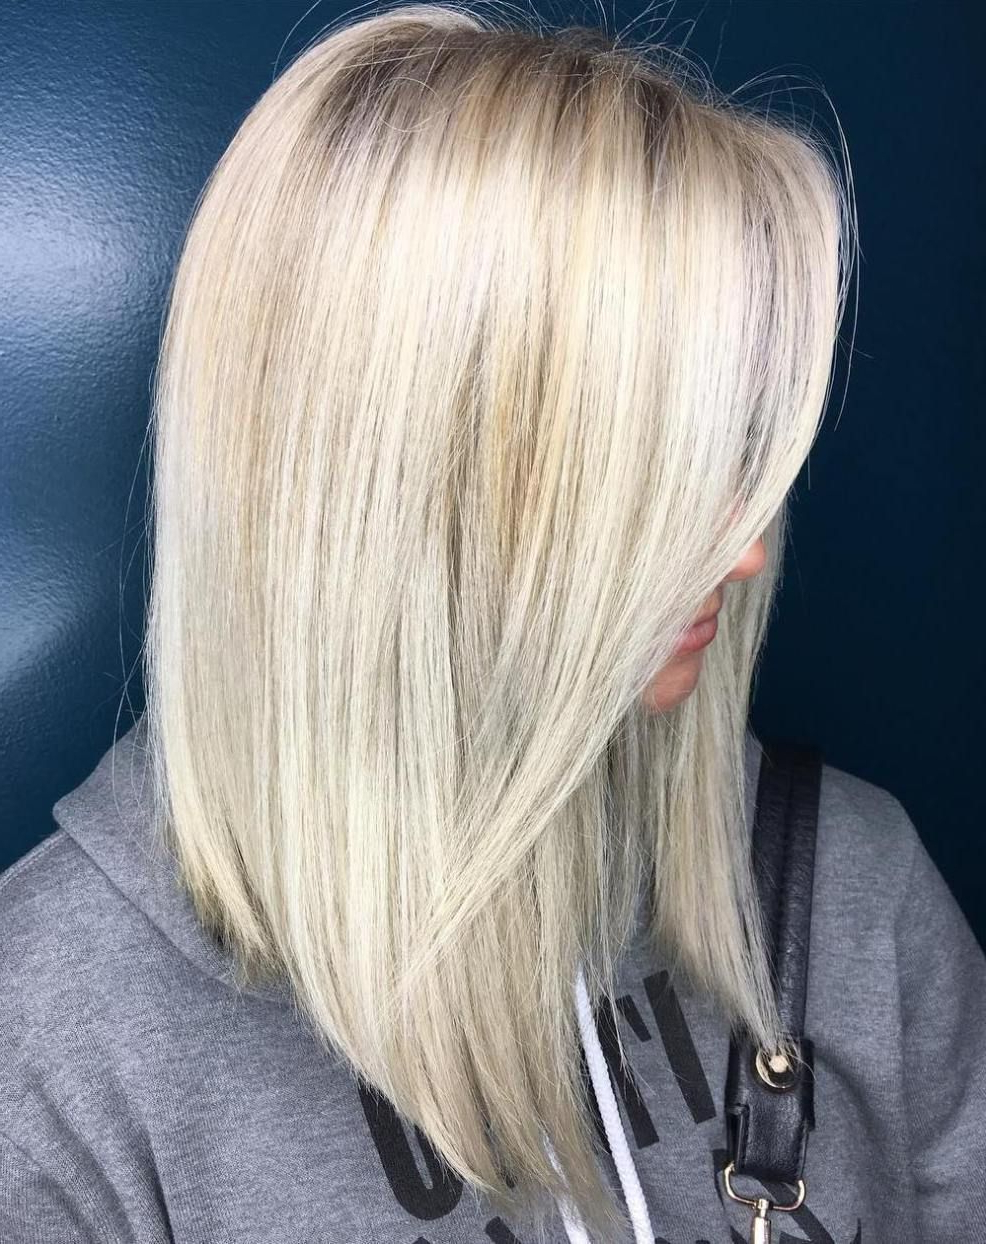 Blond Pertaining To 2017 Platinum Blonde Medium Hairstyles (View 7 of 20)